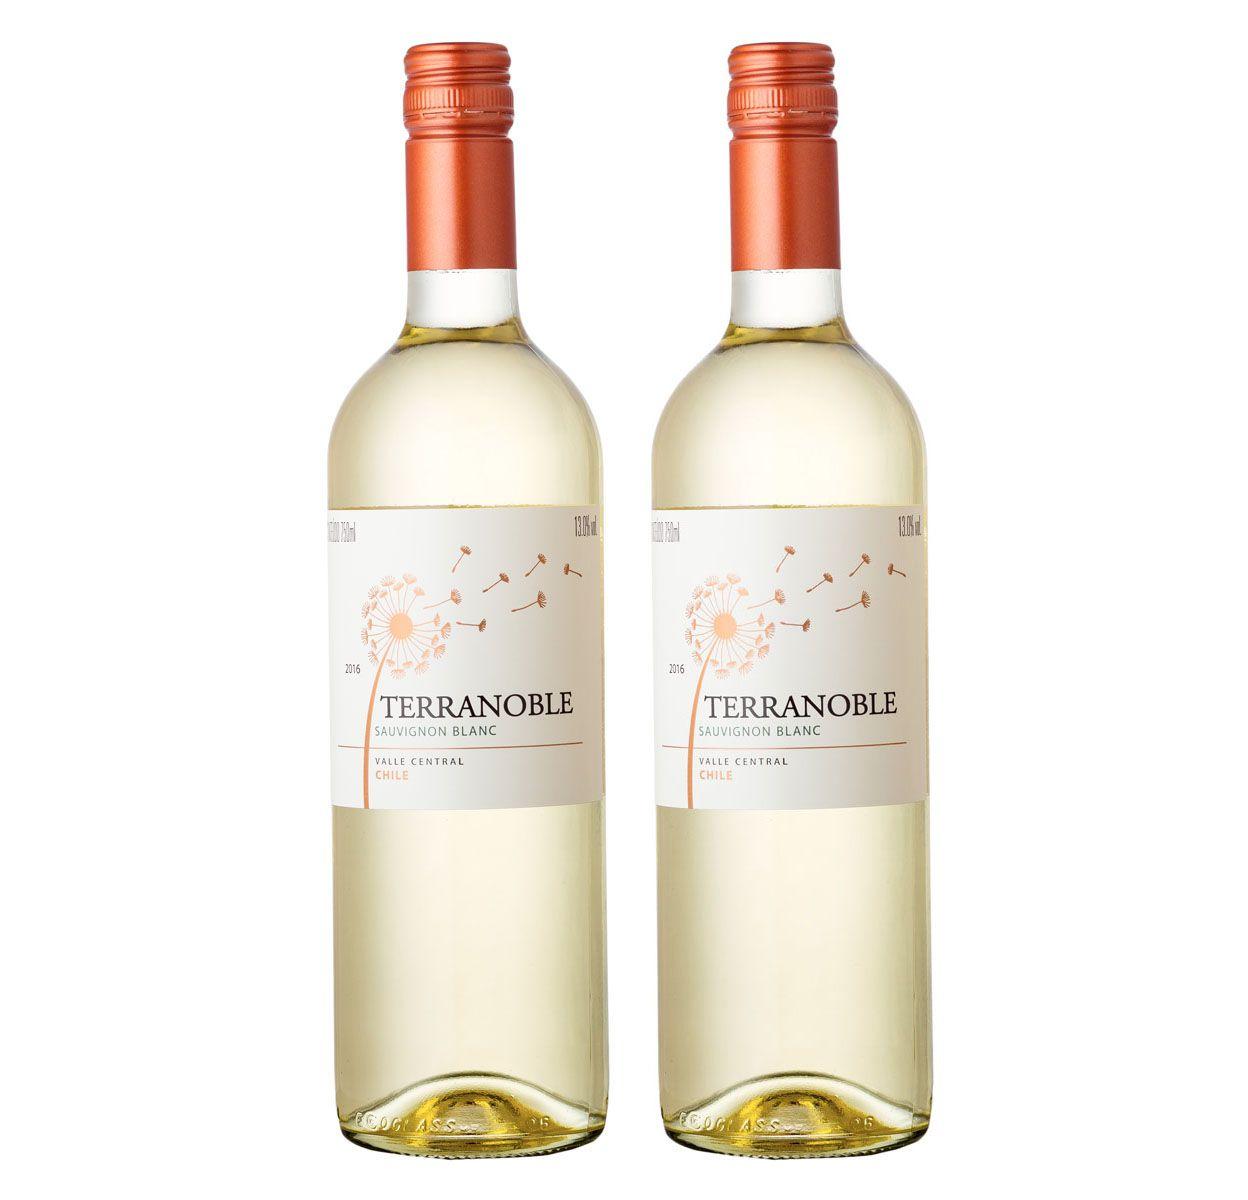 Kit com 2 Garrafas Terranoble Sauvignon Blanc